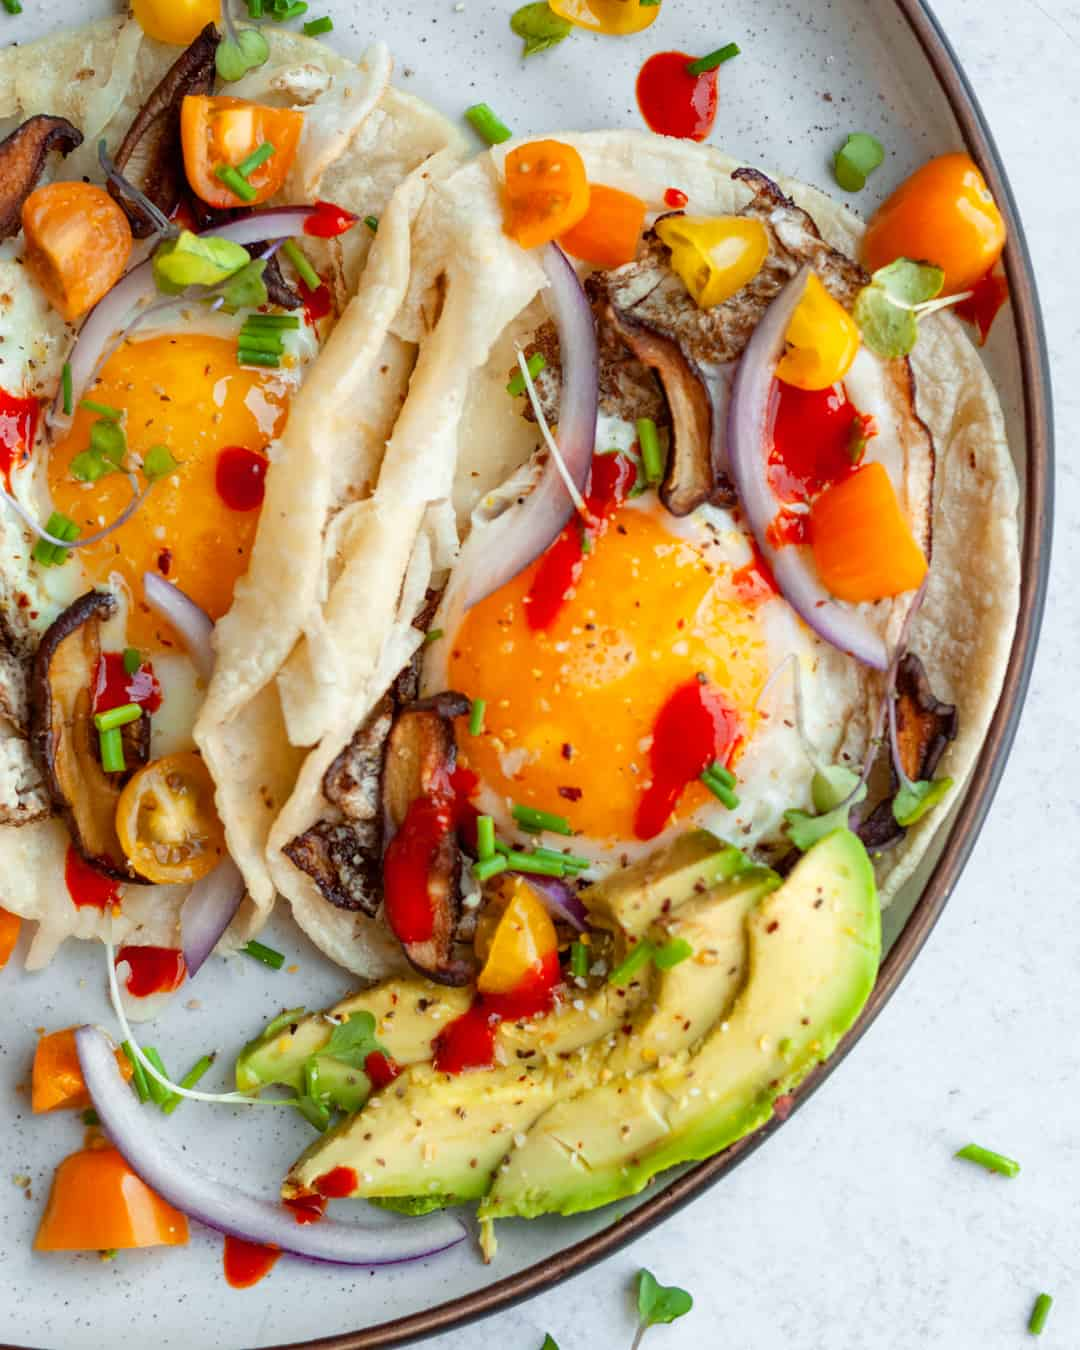 vegetarian breakfast tacos with shiitake mushrooms